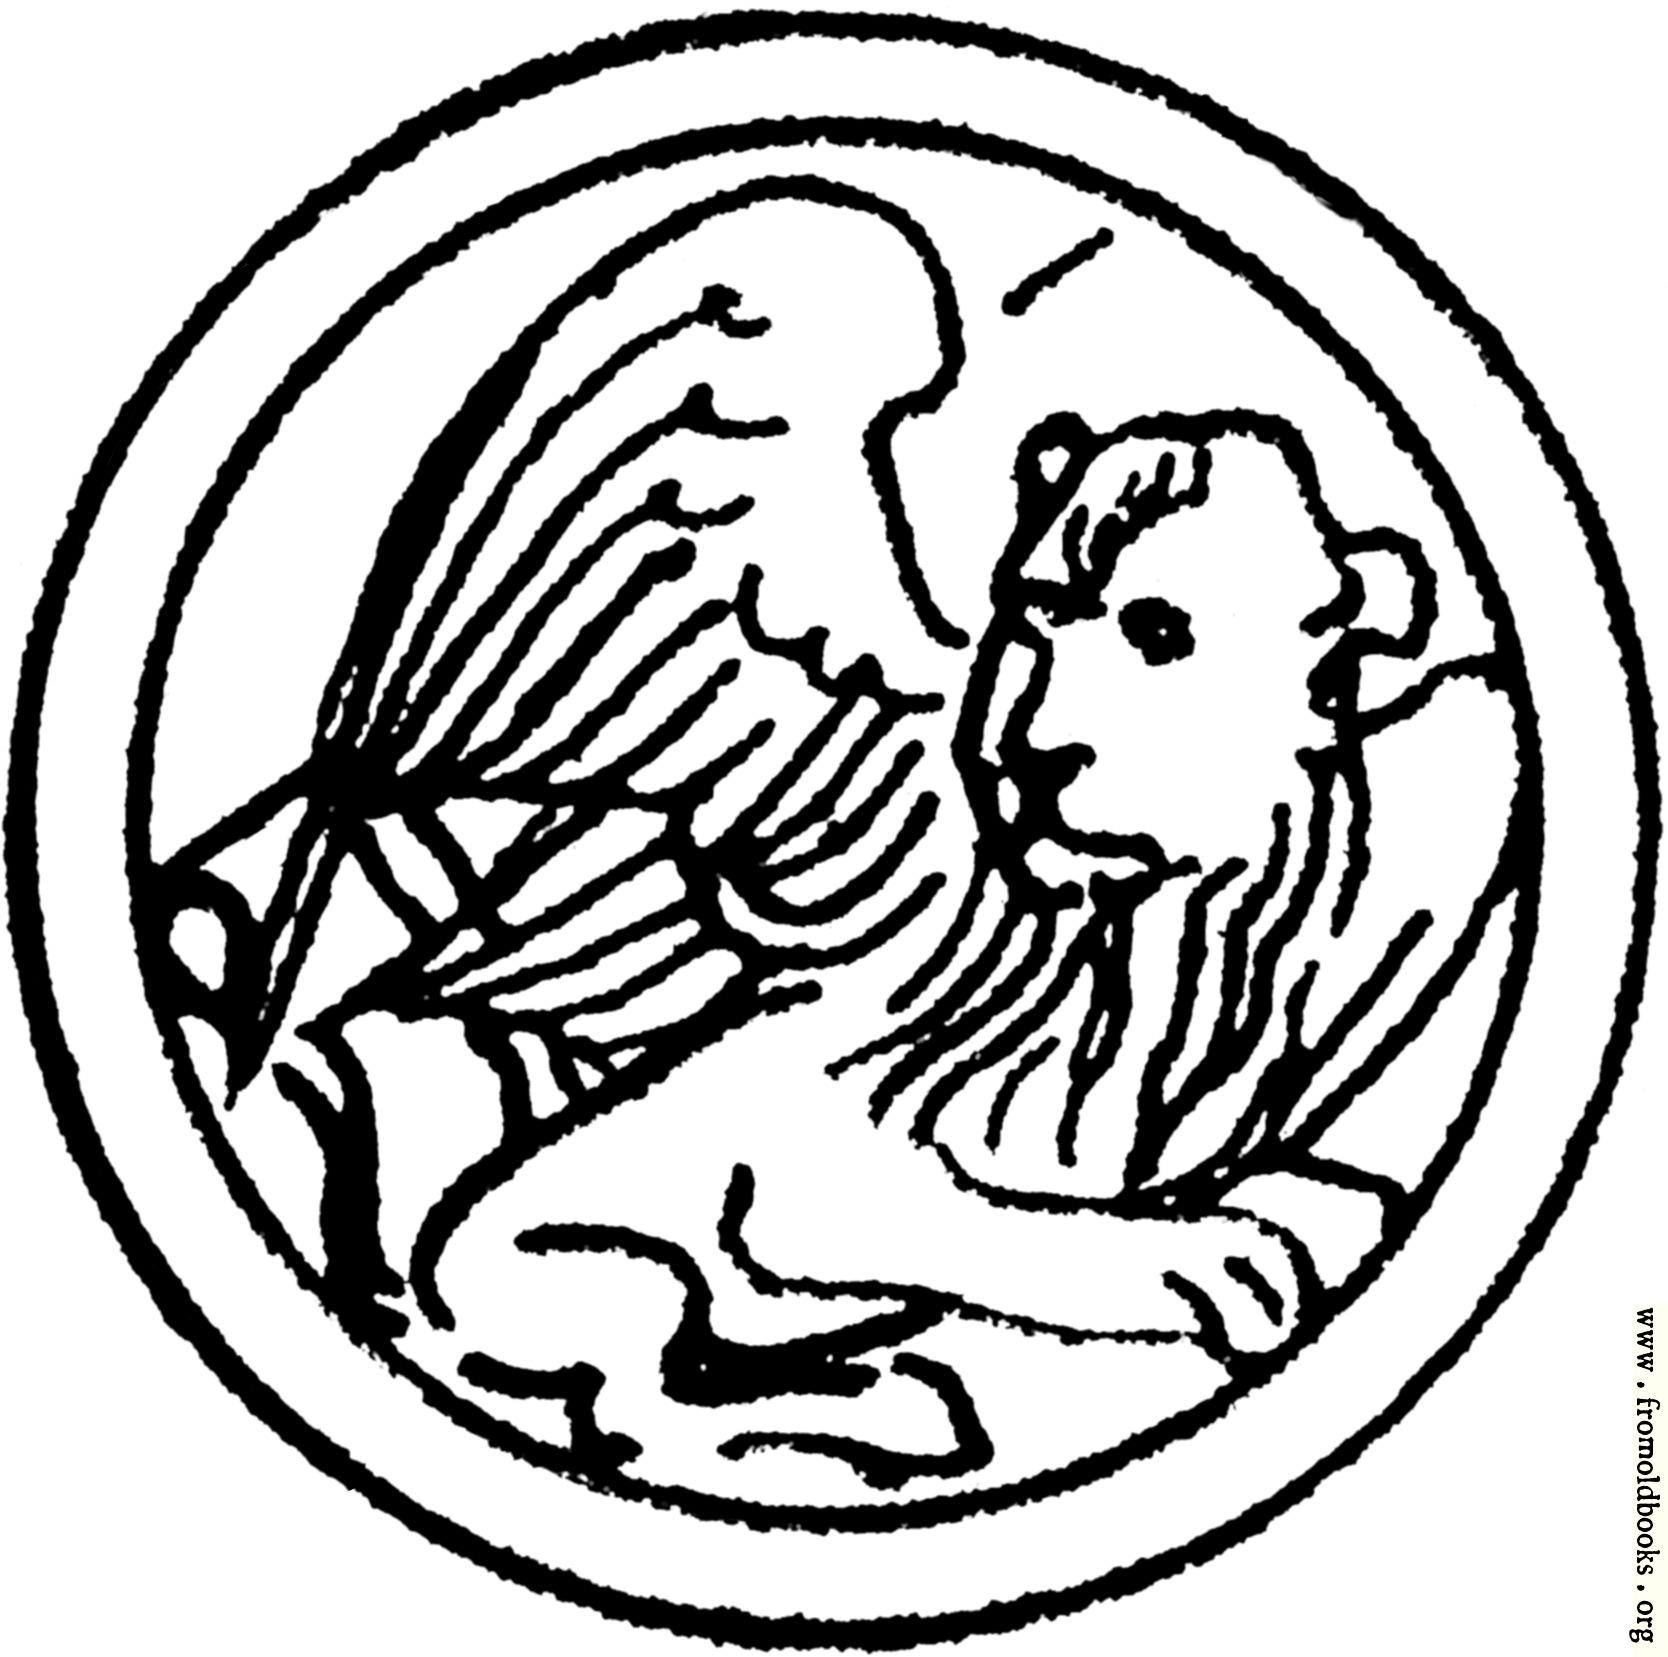 Symbol of St. Mark the Evangelist